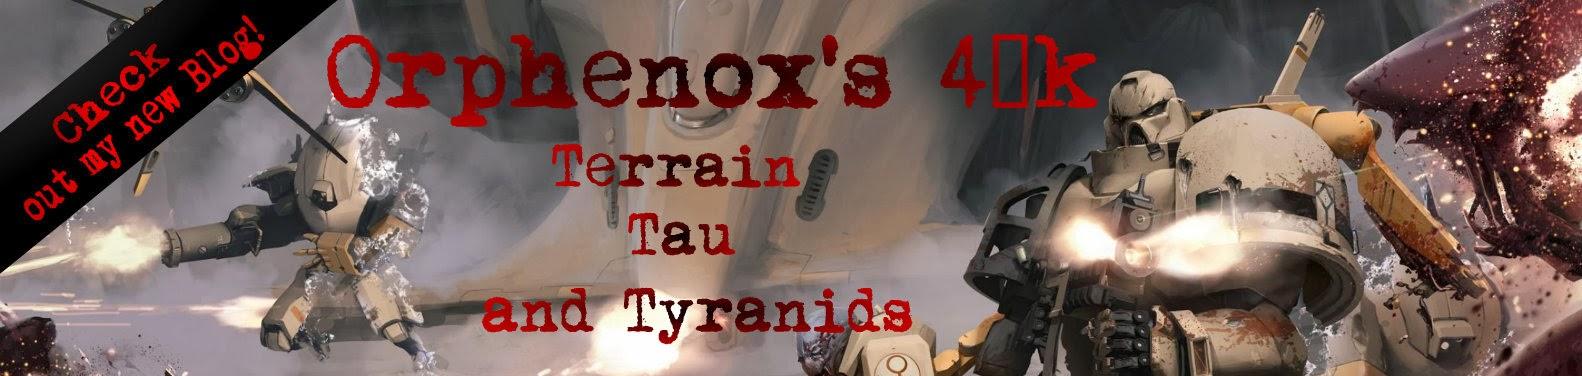 Orphenox's 40k - Terrain, Tau, and Tyranids!